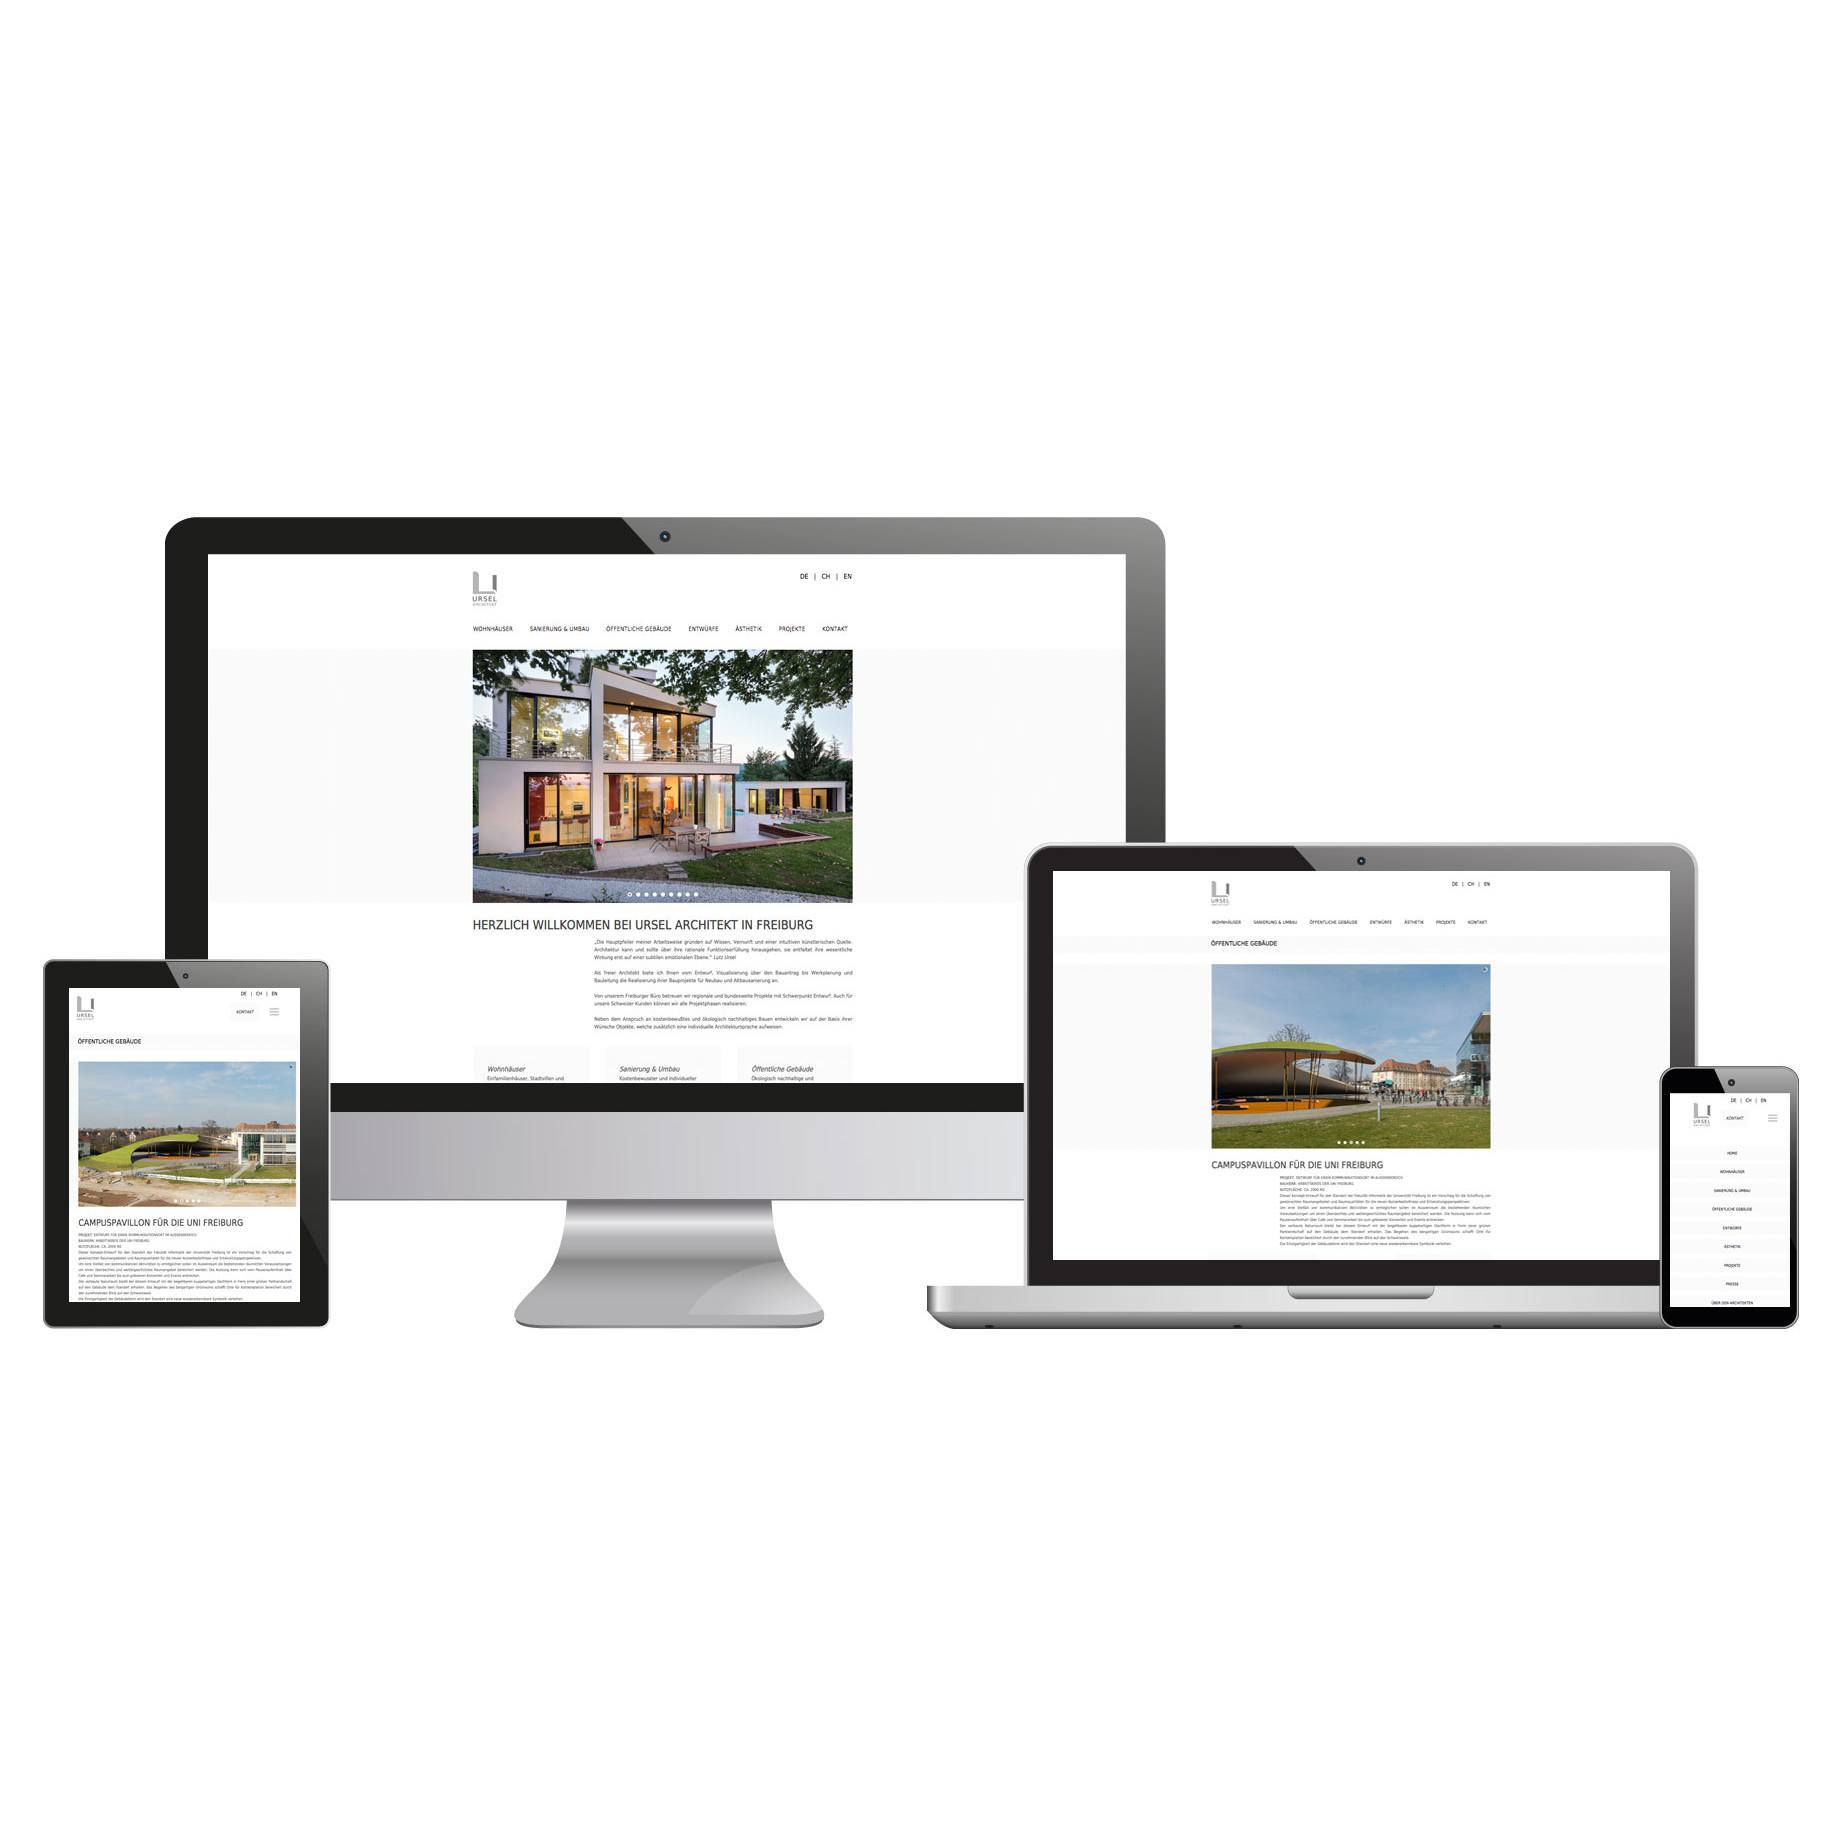 responive-webdesign-urseralrchitekt-signs-freiburg_02kopie